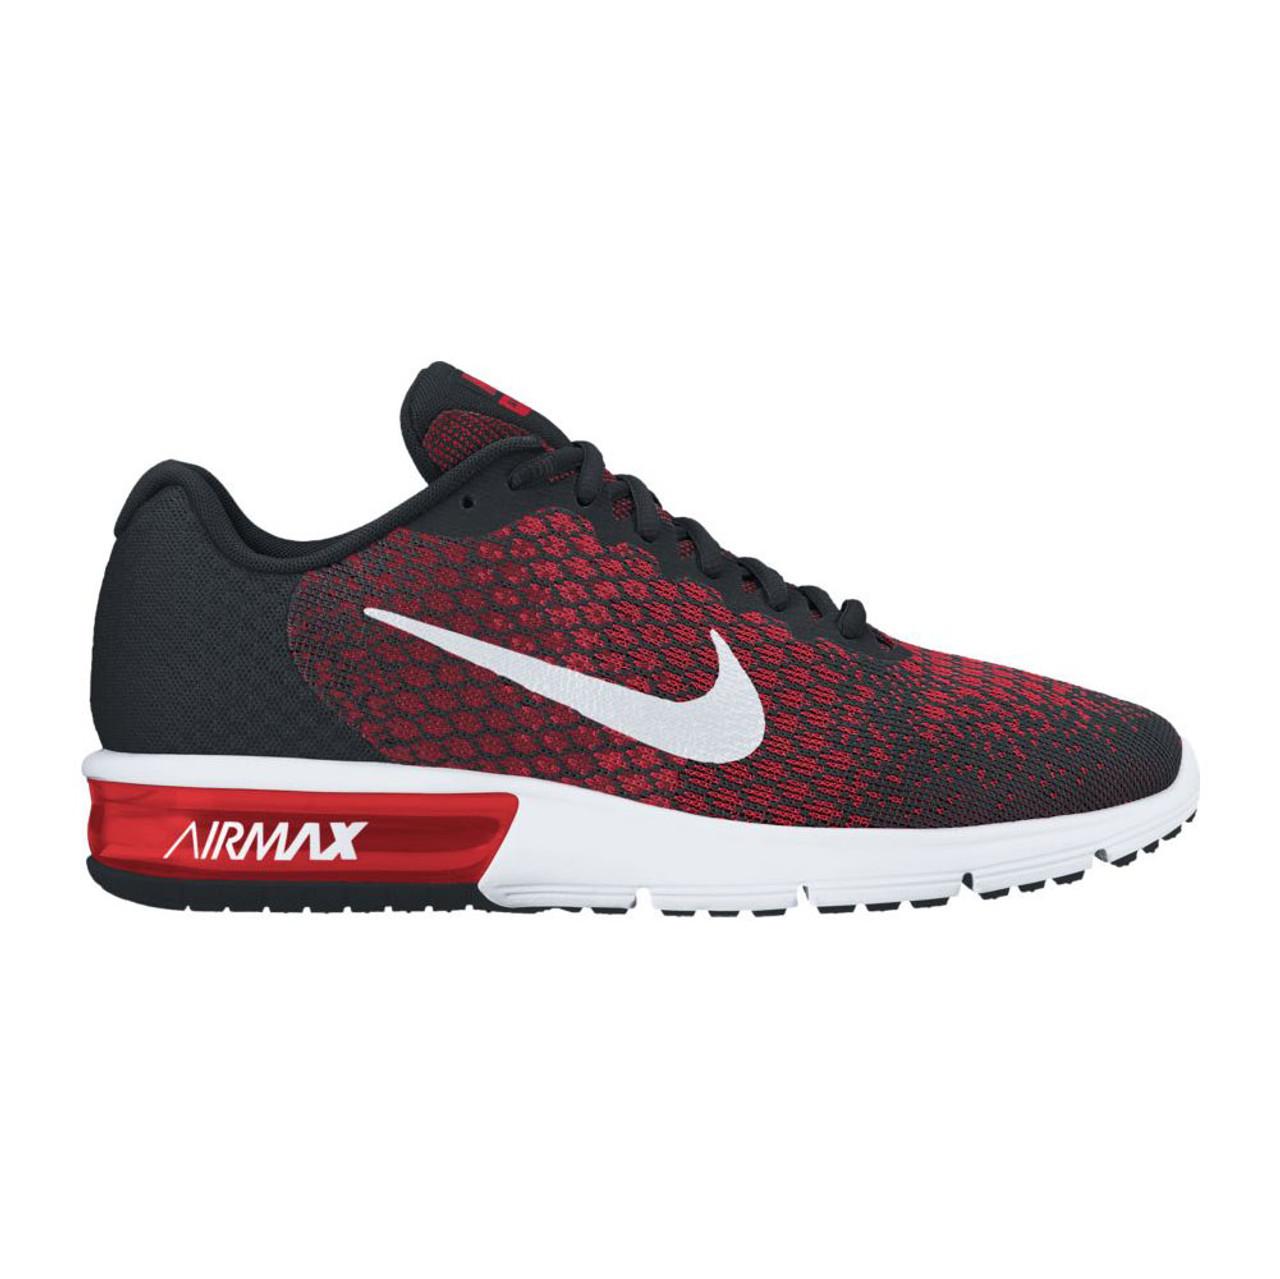 cf3fff4145 Nike Men's Air Max Sequent 2 Running Shoe Black/Red - Shop now @ Shoolu